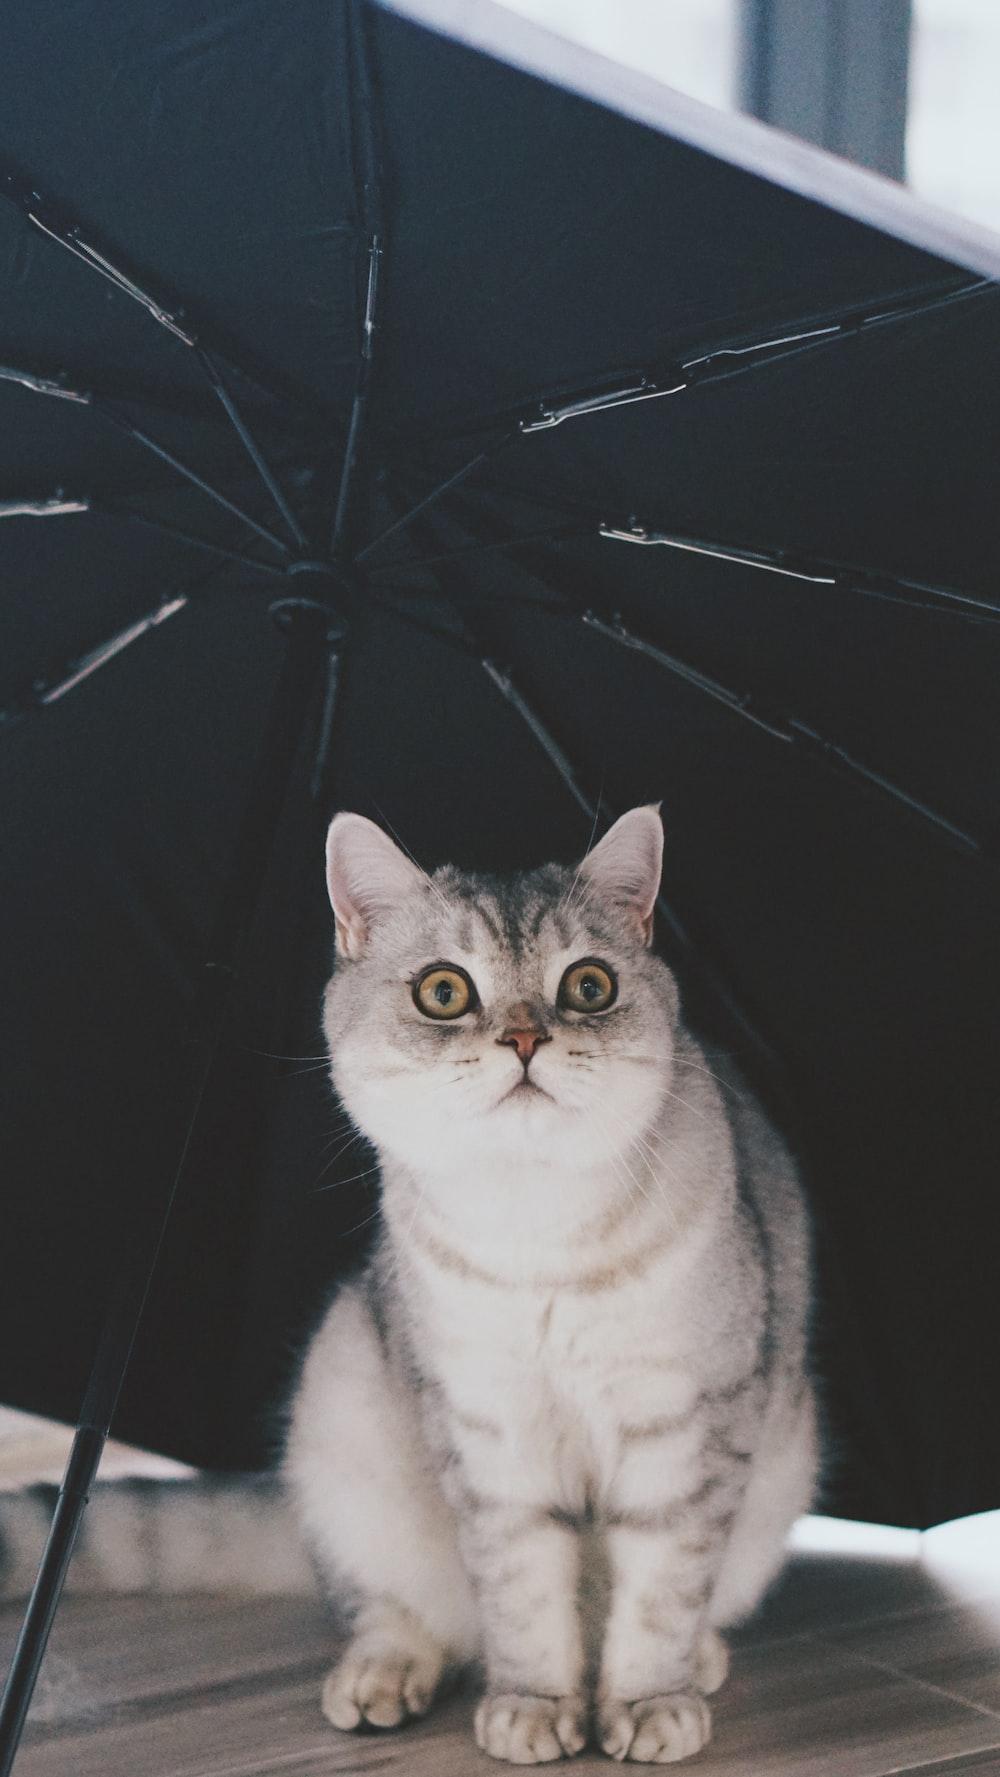 gray and white cat under black umbrella